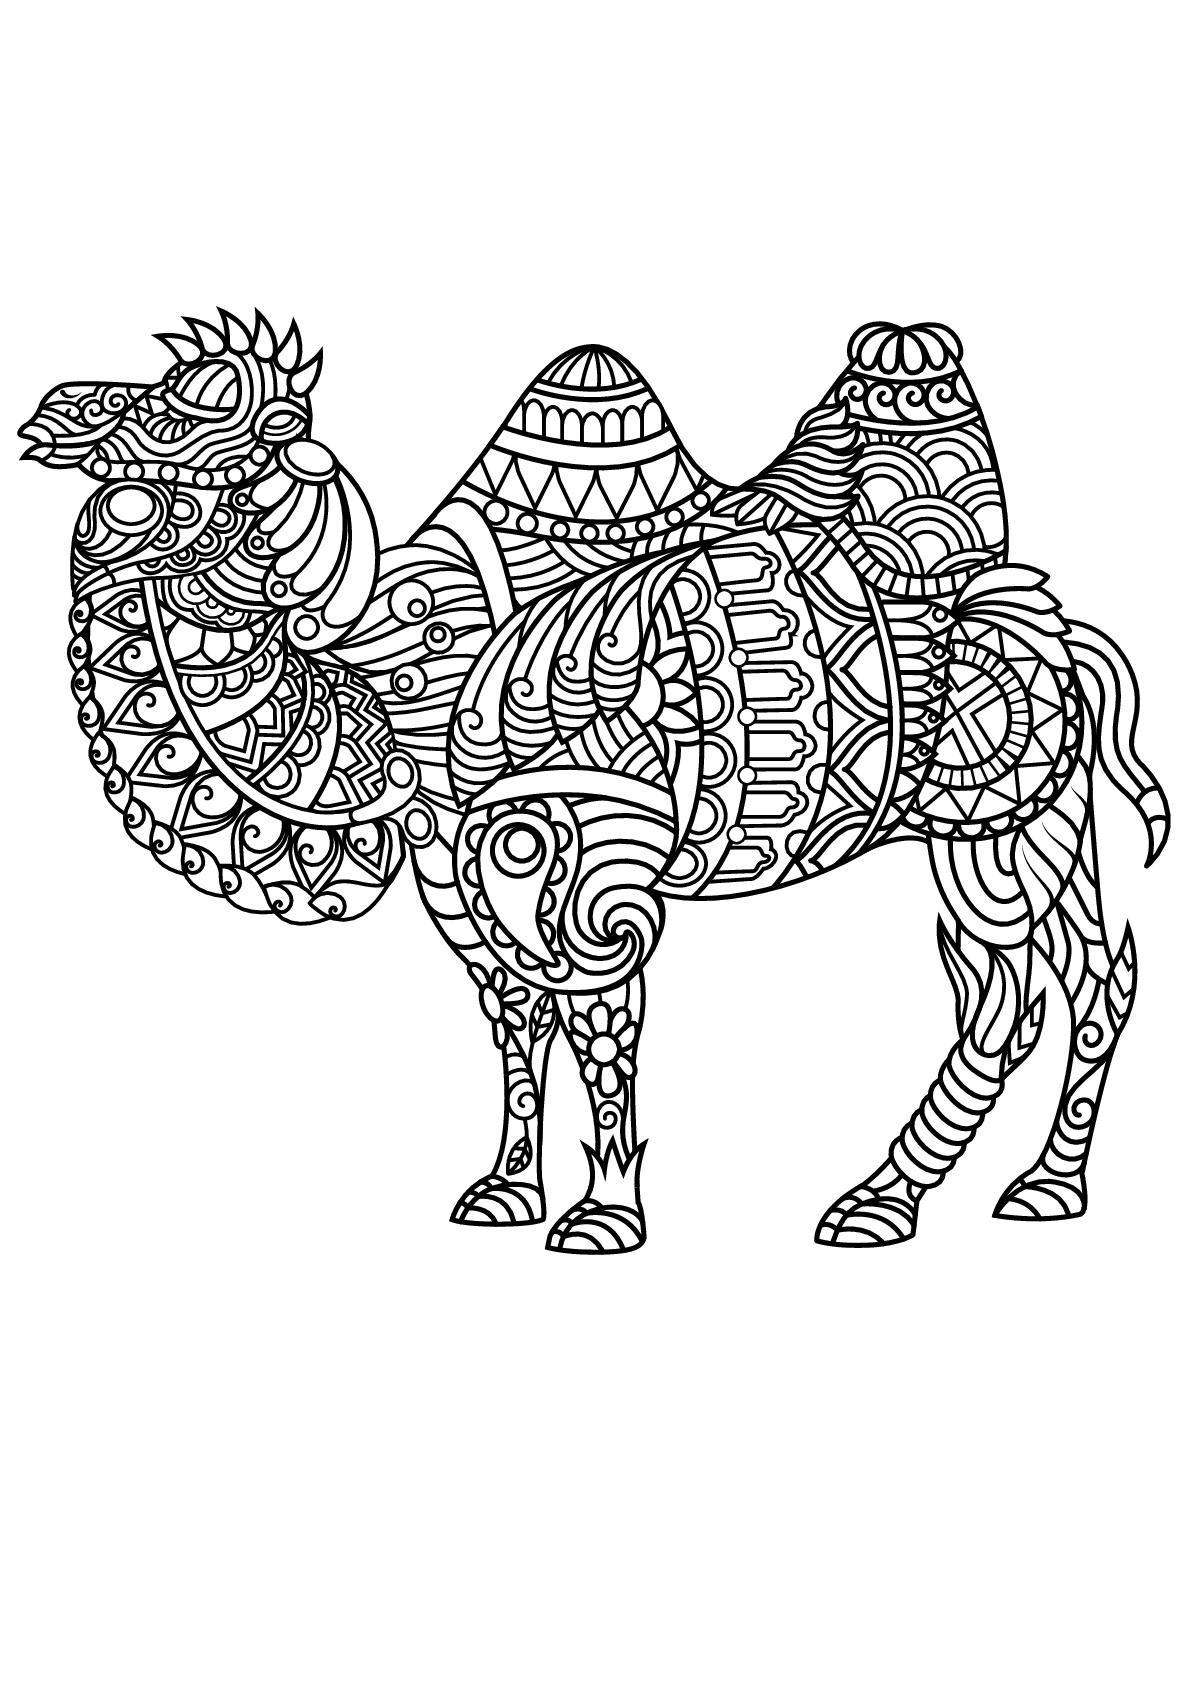 Malbuch Fur Erwachsene : Kamele - 1